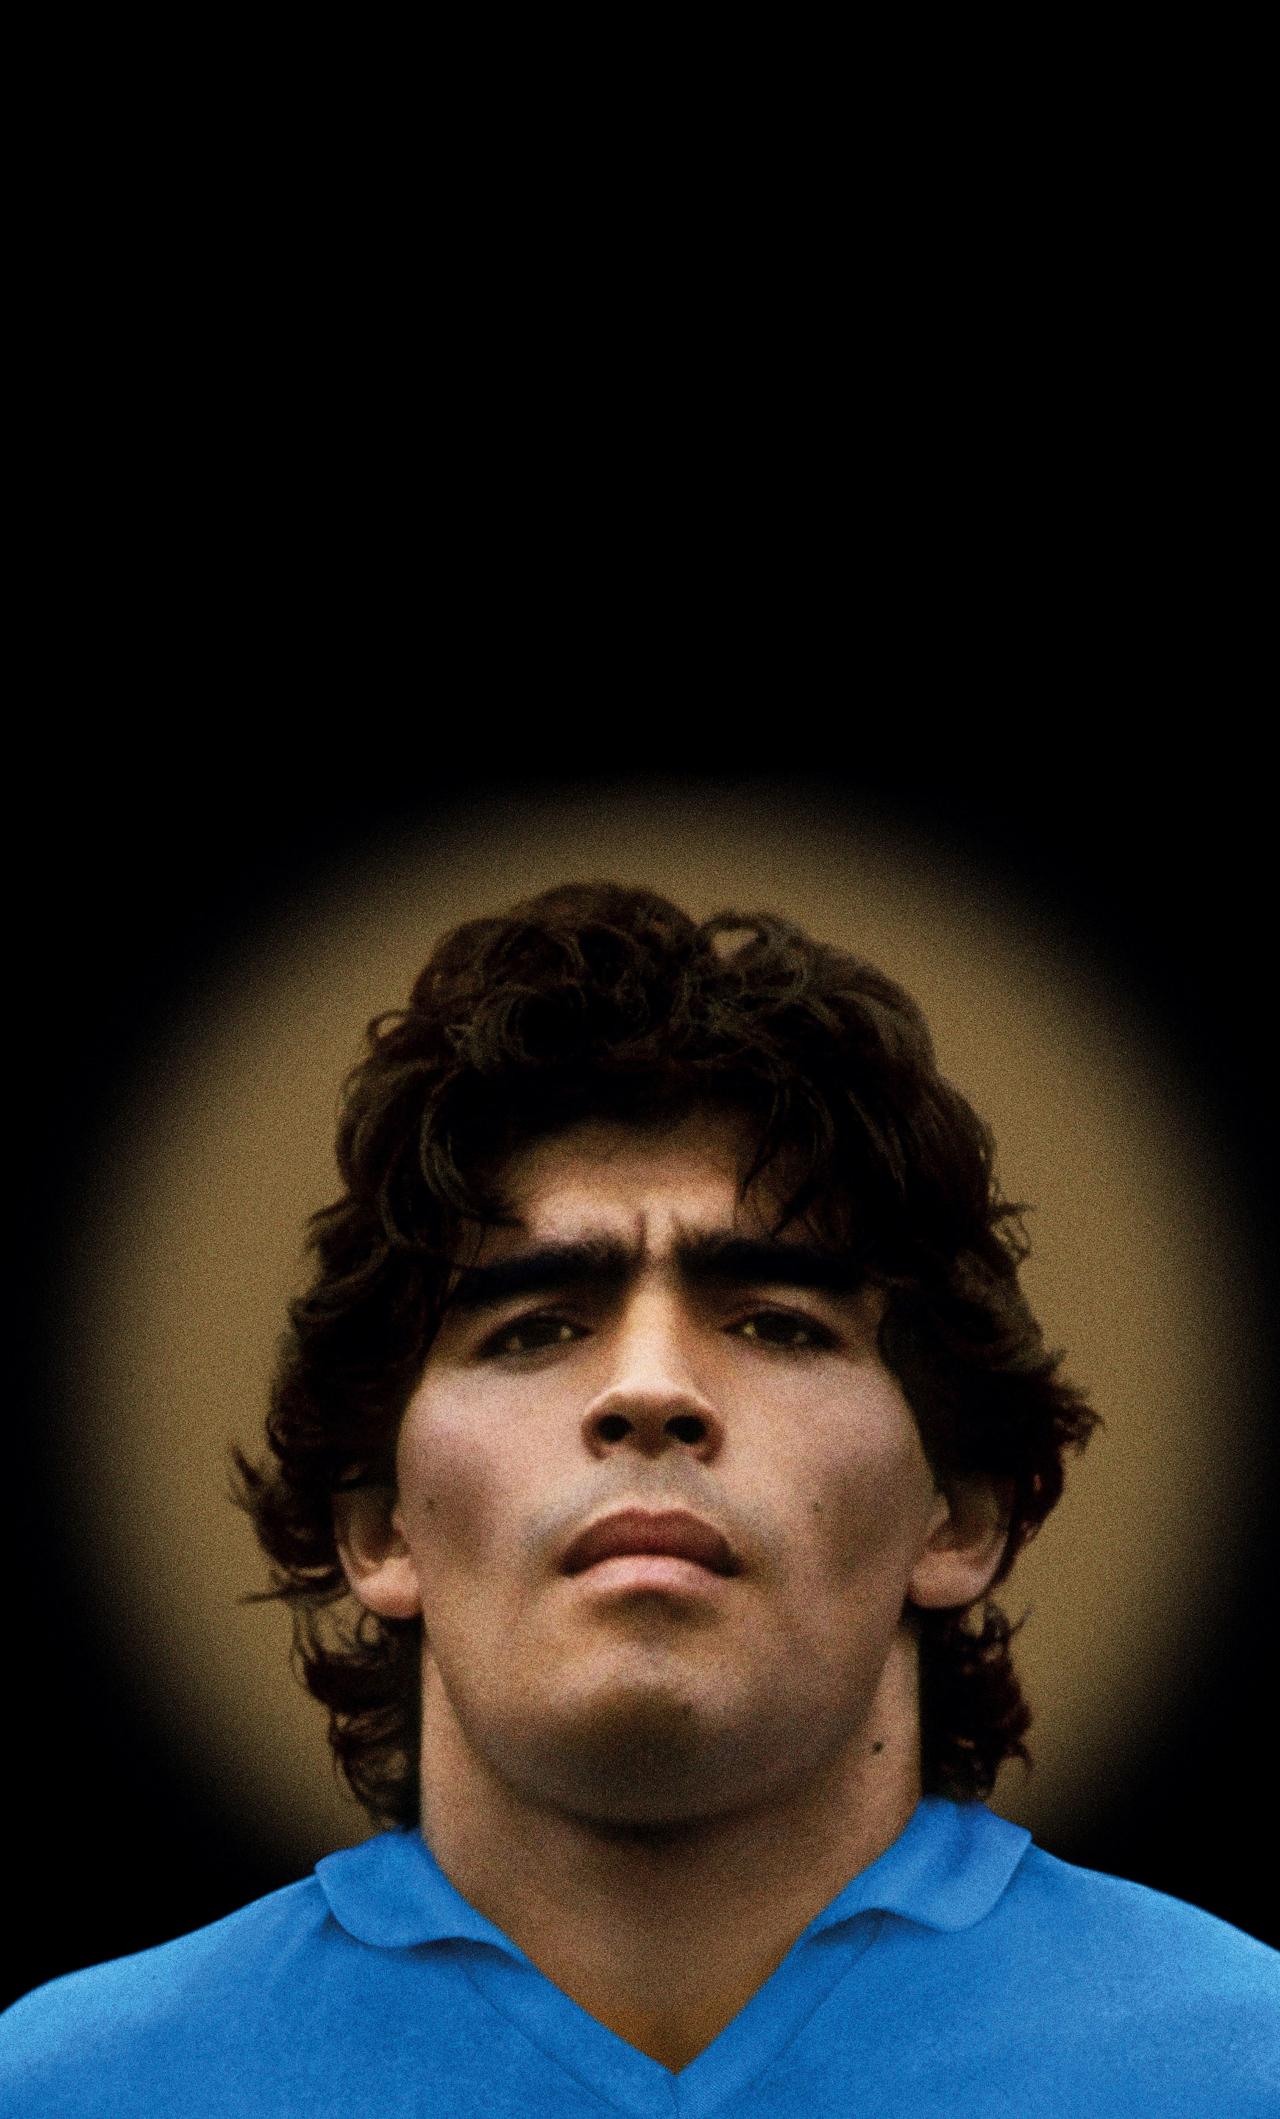 Hd Wallpaper Diego Maradona Asif Kapadia 1324916 Hd Wallpaper Backgrounds Download